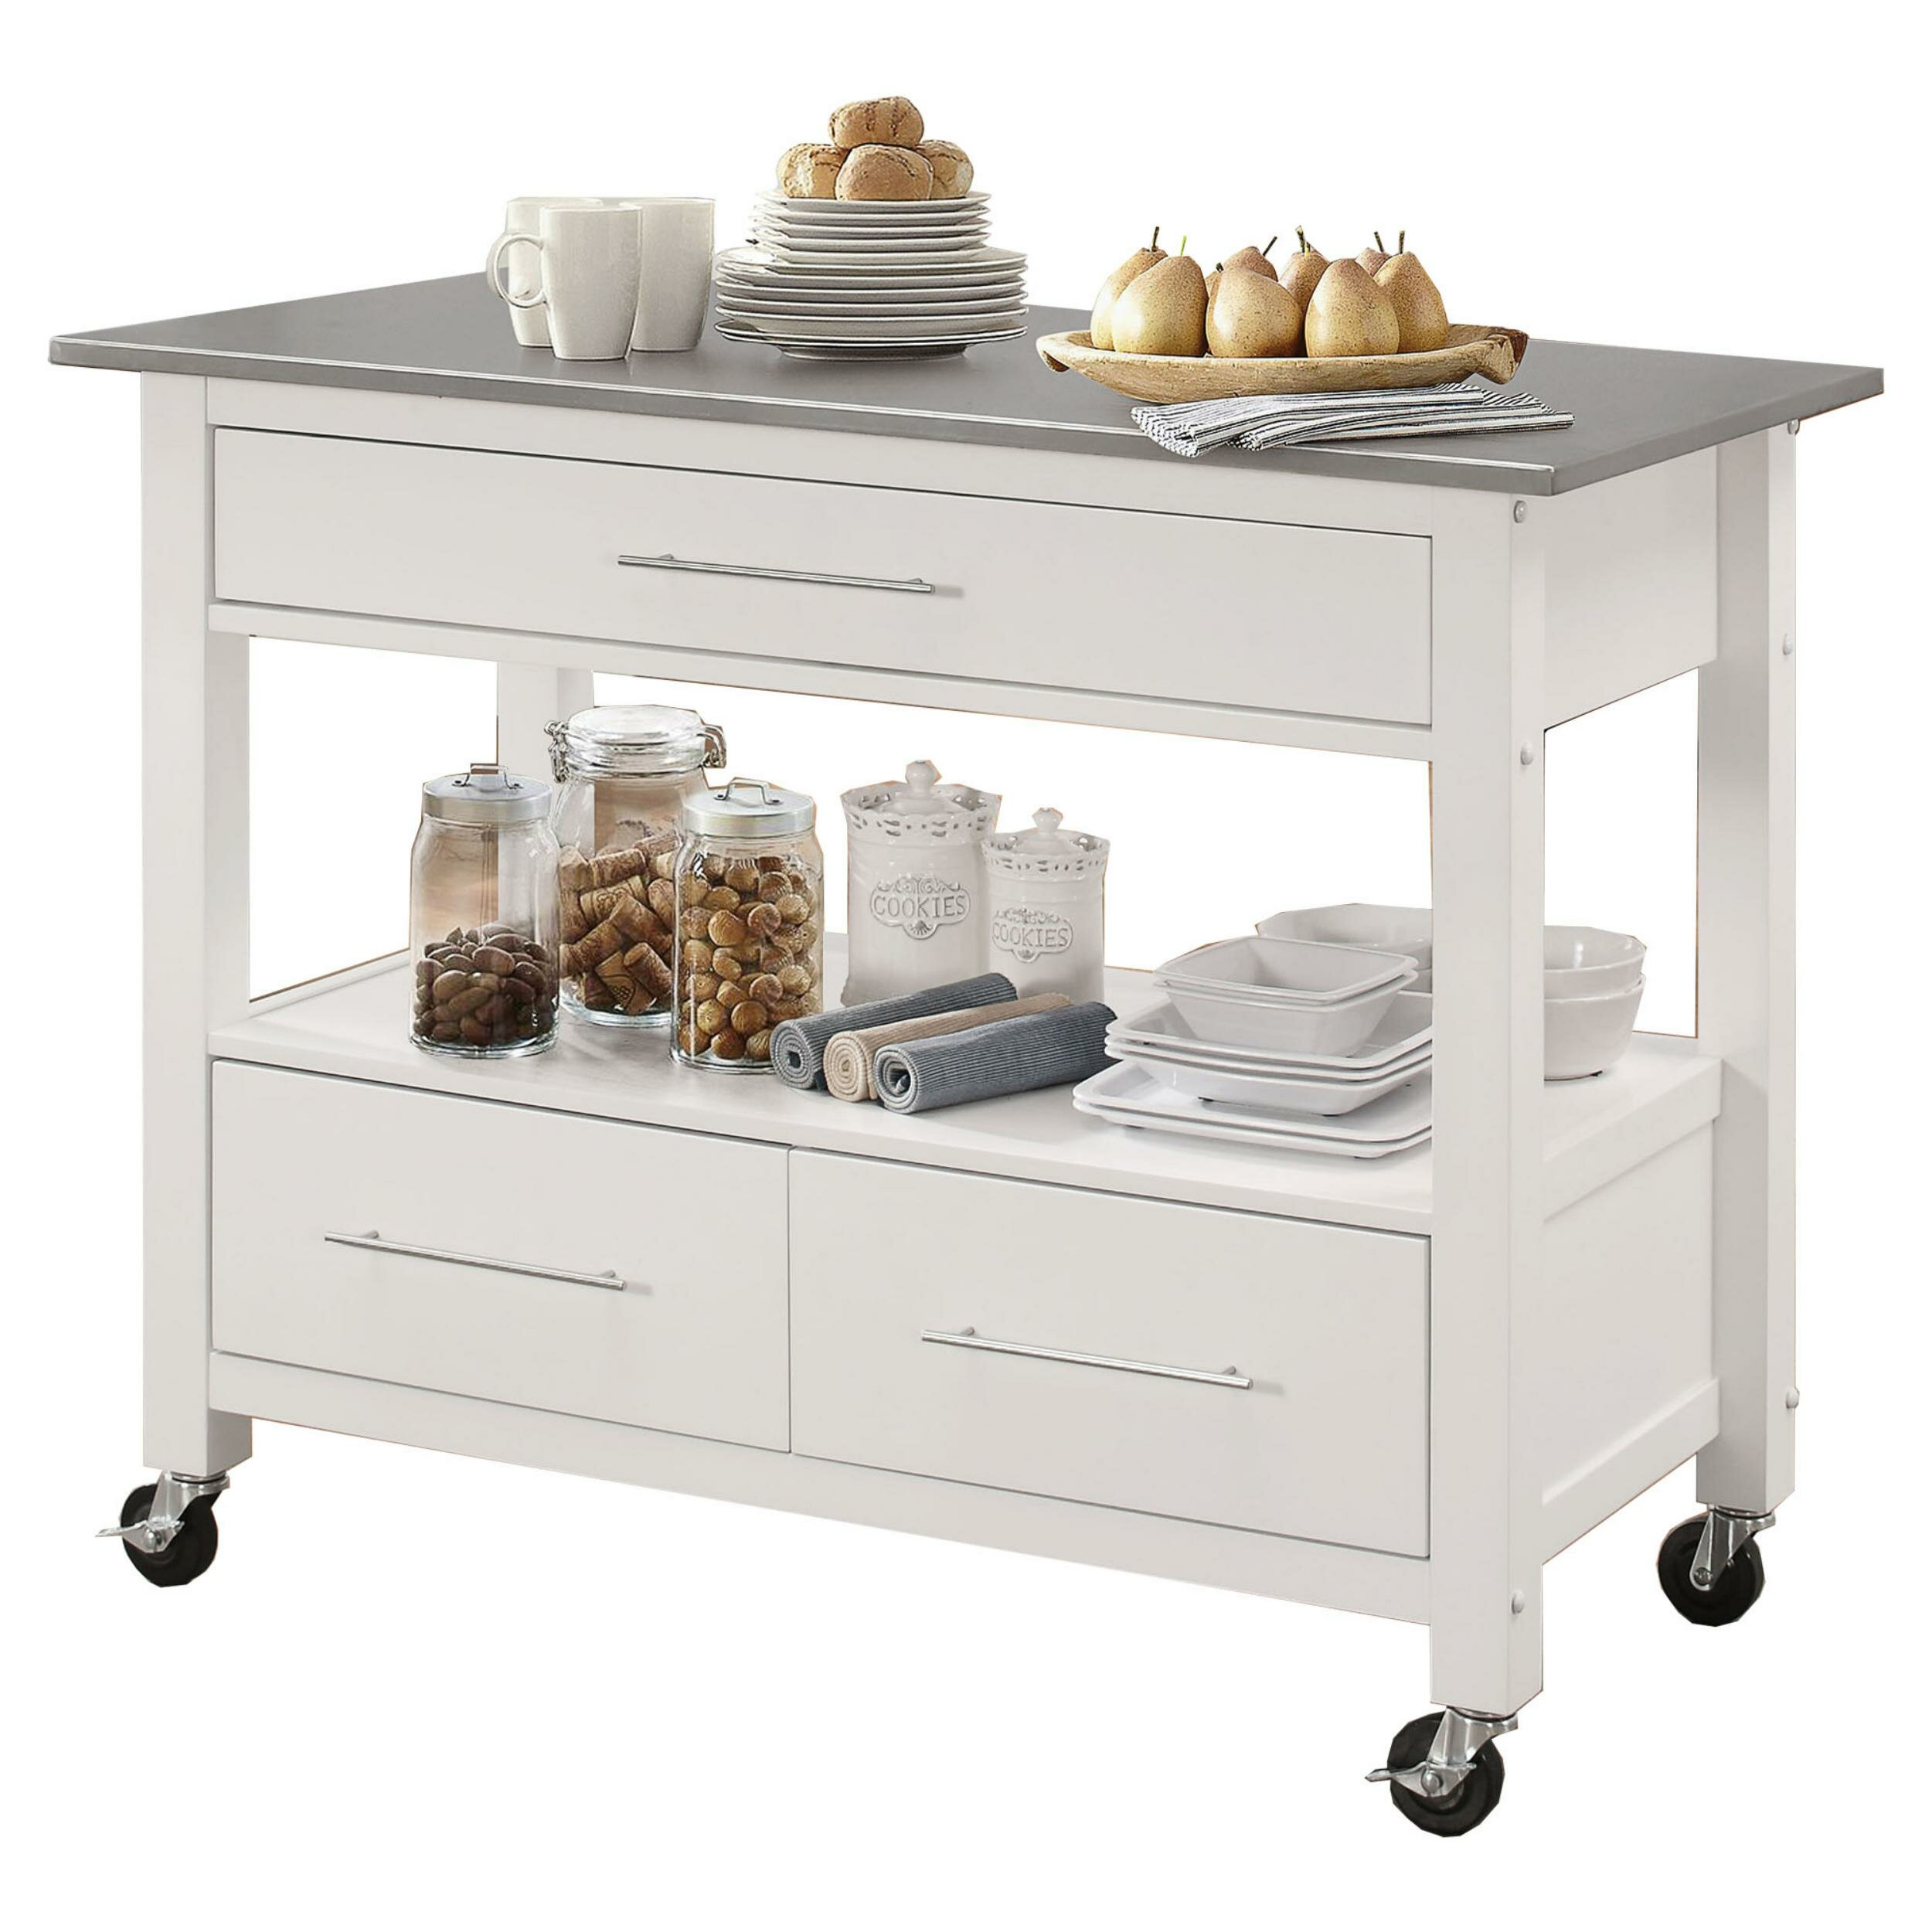 Krumm Kitchen Cart With Stainless Steel Top